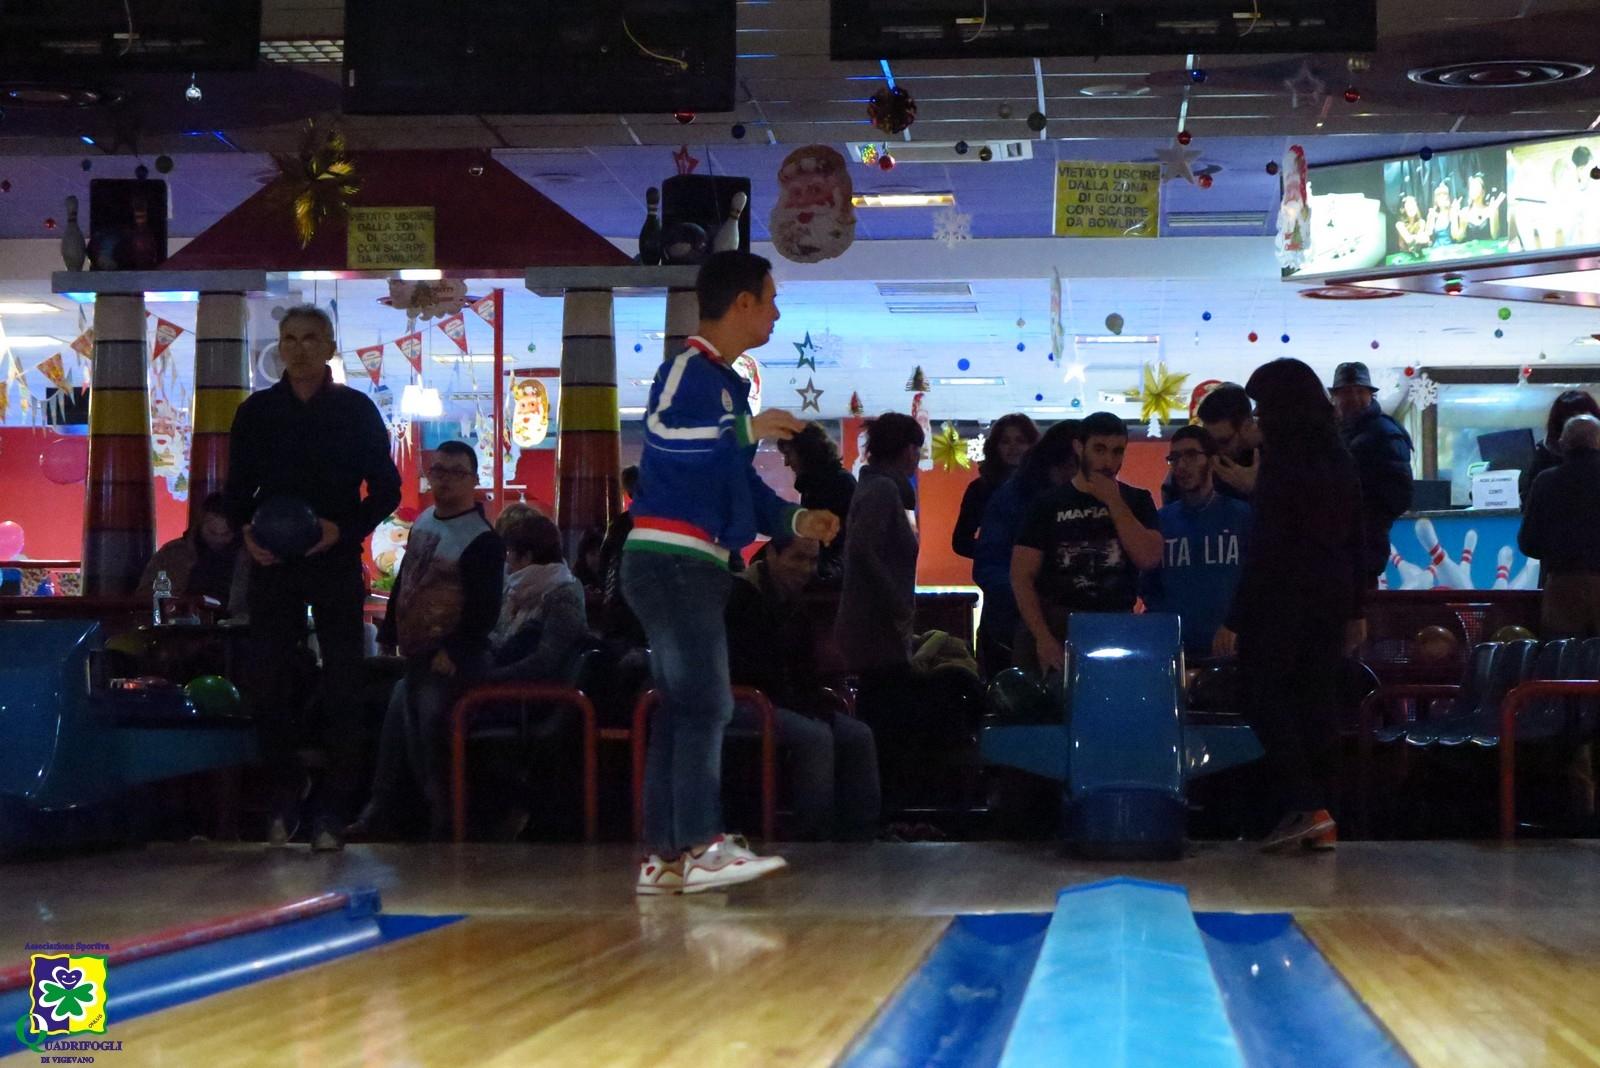 Torneo Bowling Vigevano 19-12-2018 - 015